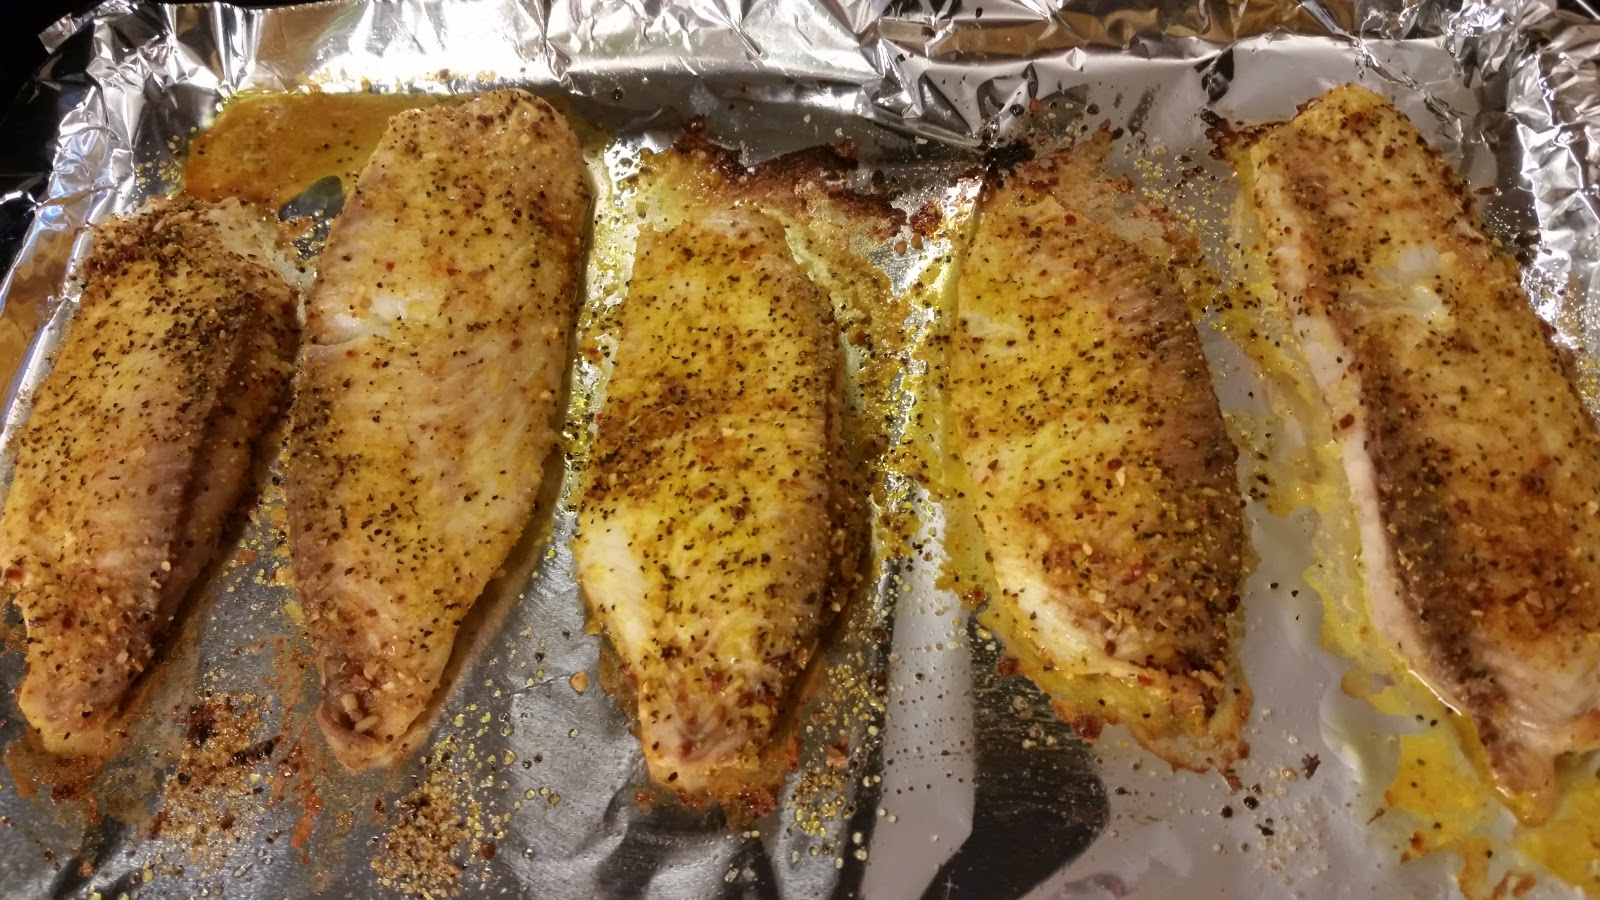 2. Bake Fish